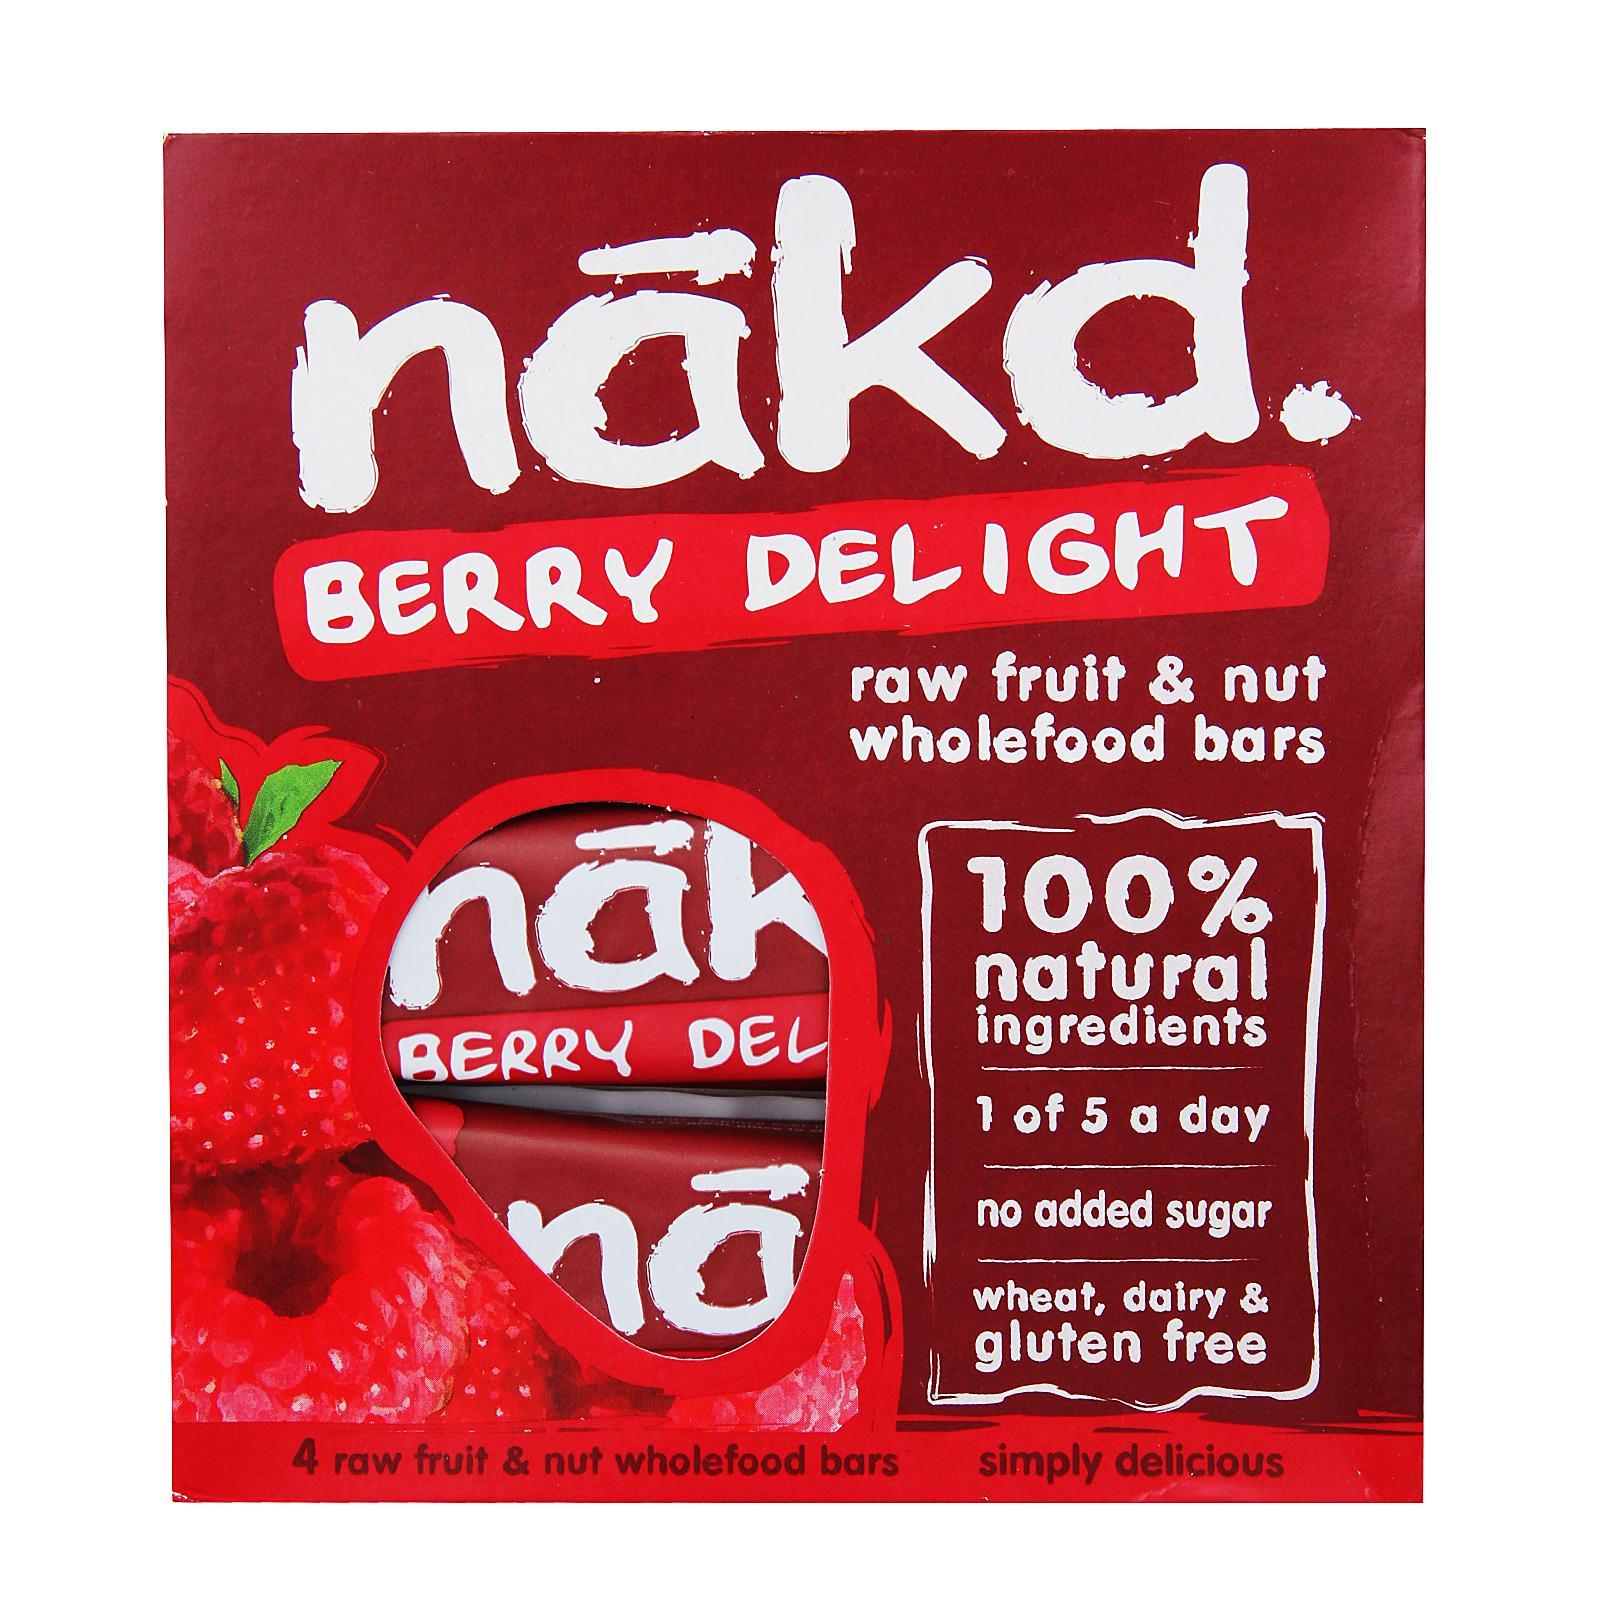 Nakd Gluten Free Berry Delight Wholefood Bars By Redmart.